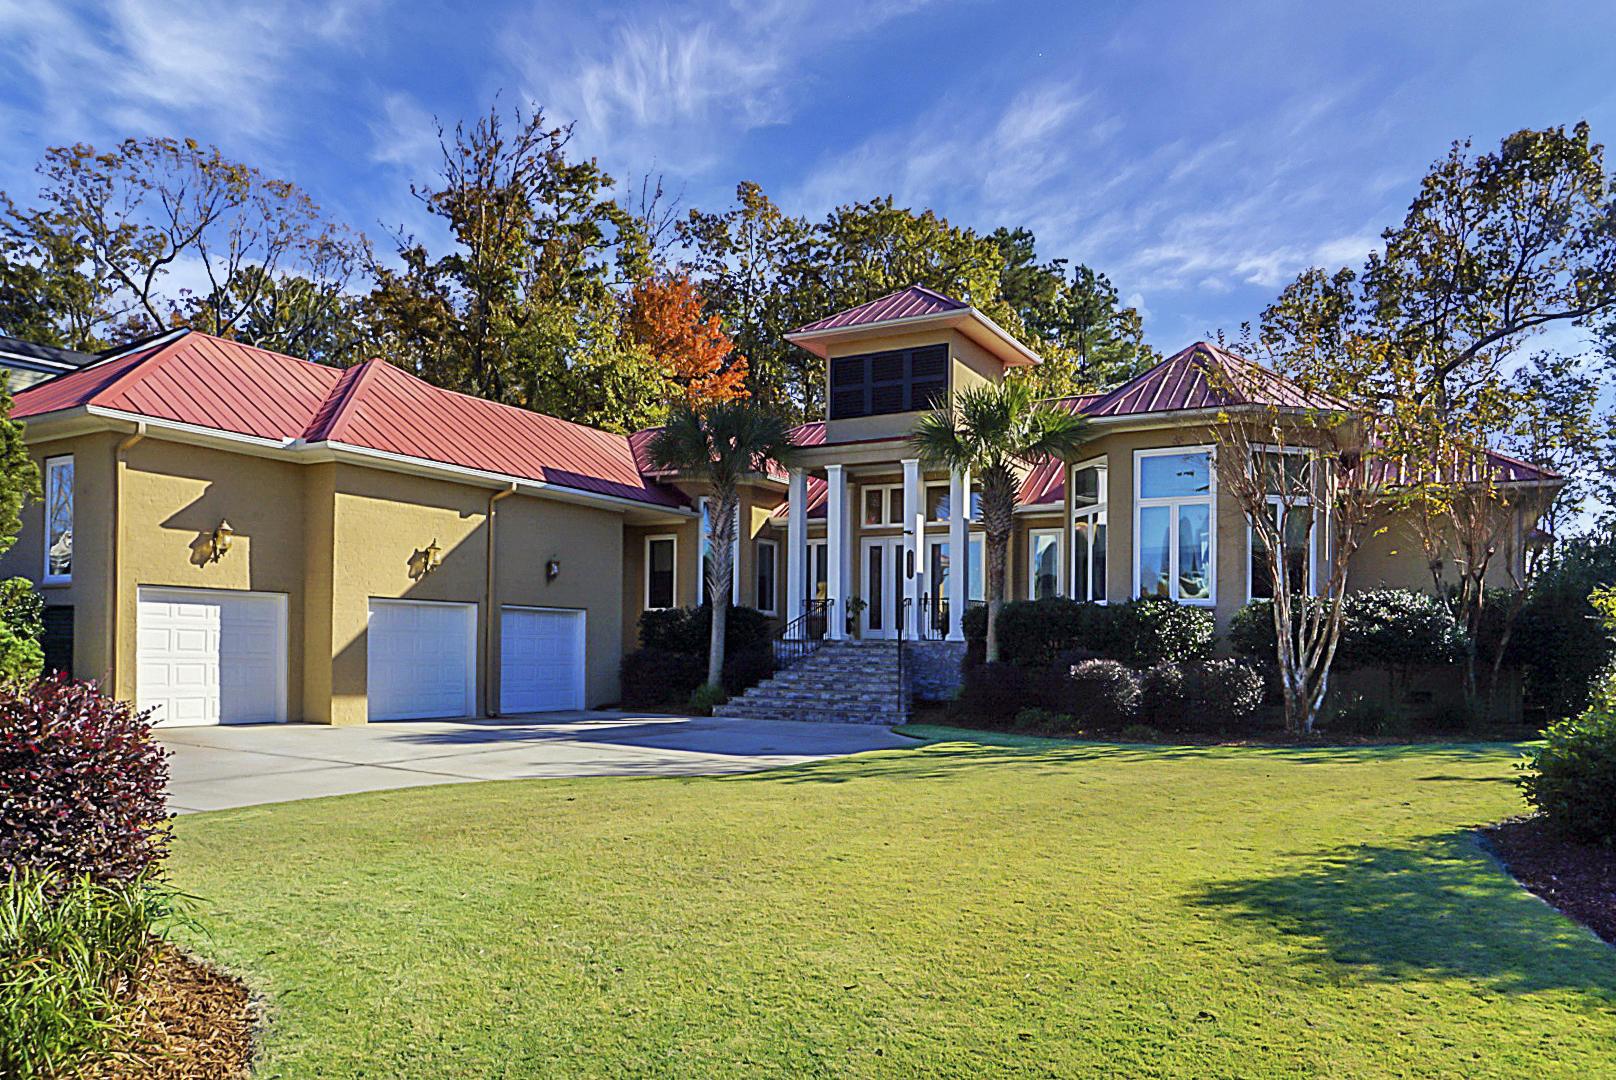 Dunes West Homes For Sale - 2389 Darts Cove, Mount Pleasant, SC - 60